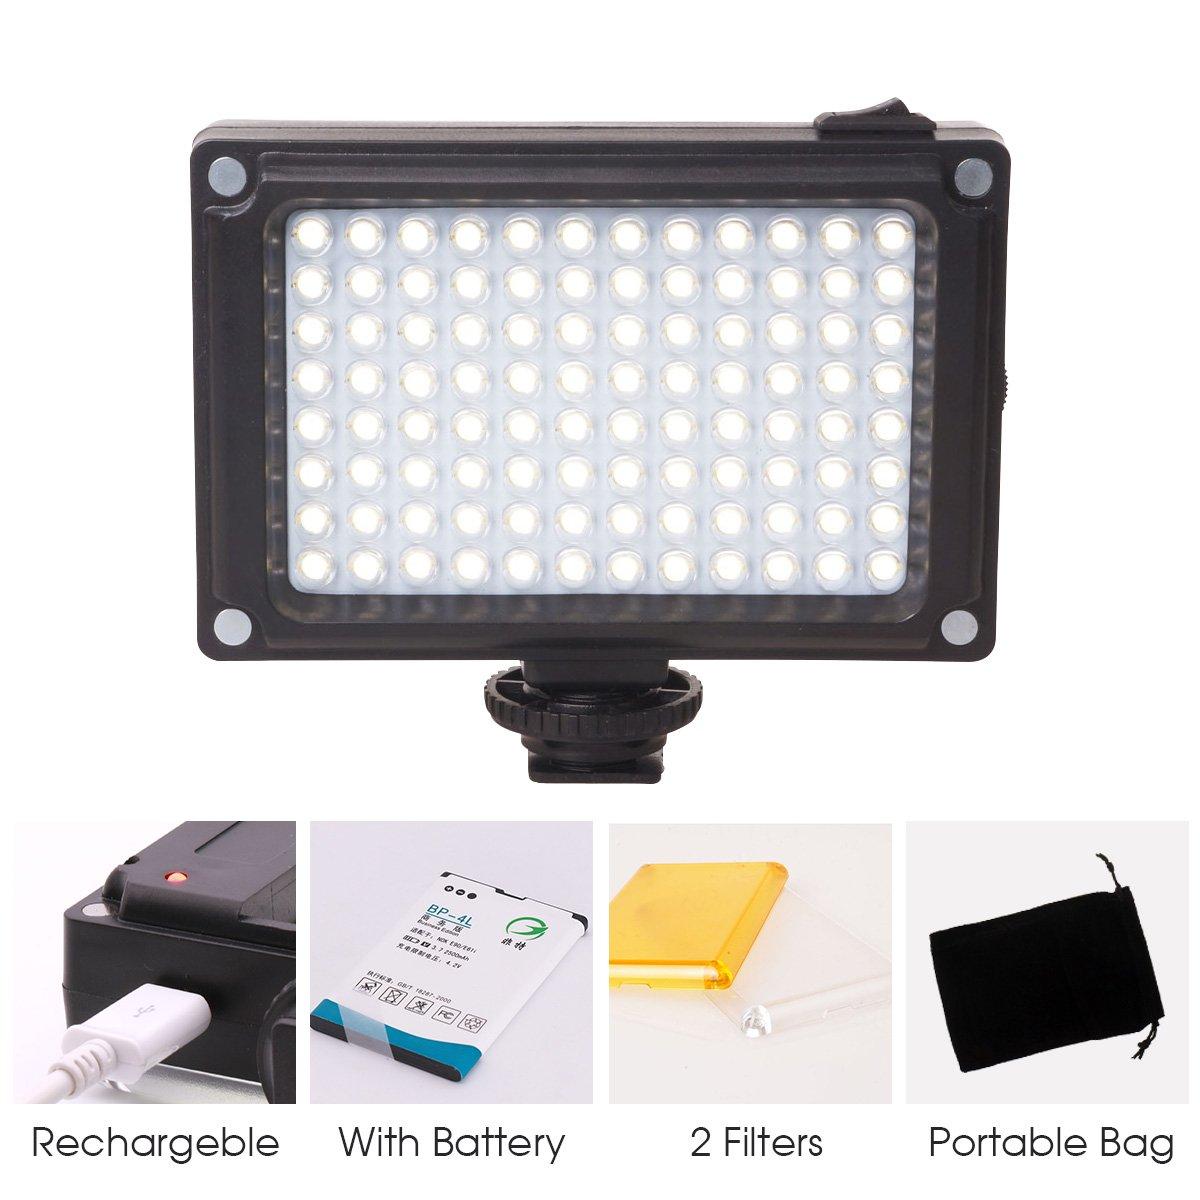 Rechargeble 96 LED Video Light,Ulanzi Pocket Mini on Camera Led Light with 2500mAh Battery and Magnet Filters for Sony Panasonic Canon Nikon DSLR Camcorder by ULANZI